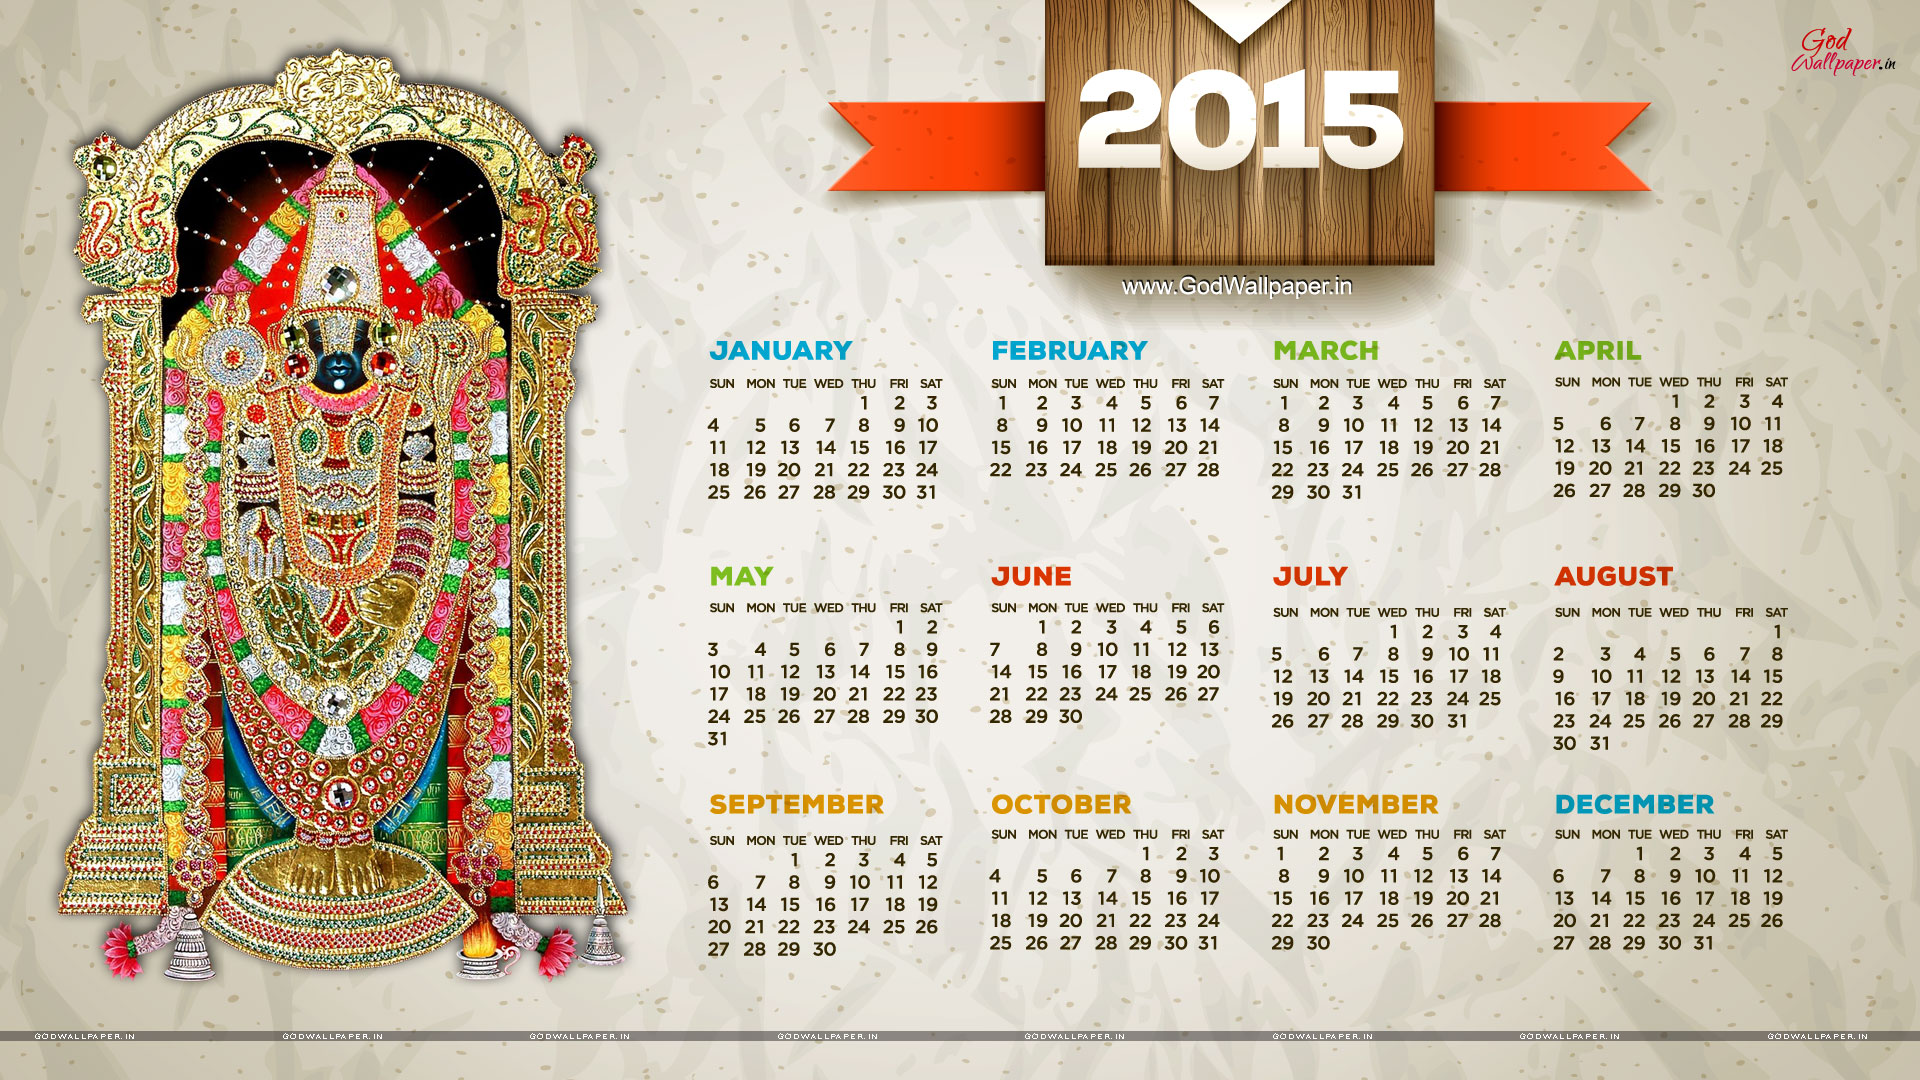 48] Desktop Wallpaper Calendar 2015 on WallpaperSafari 1920x1080